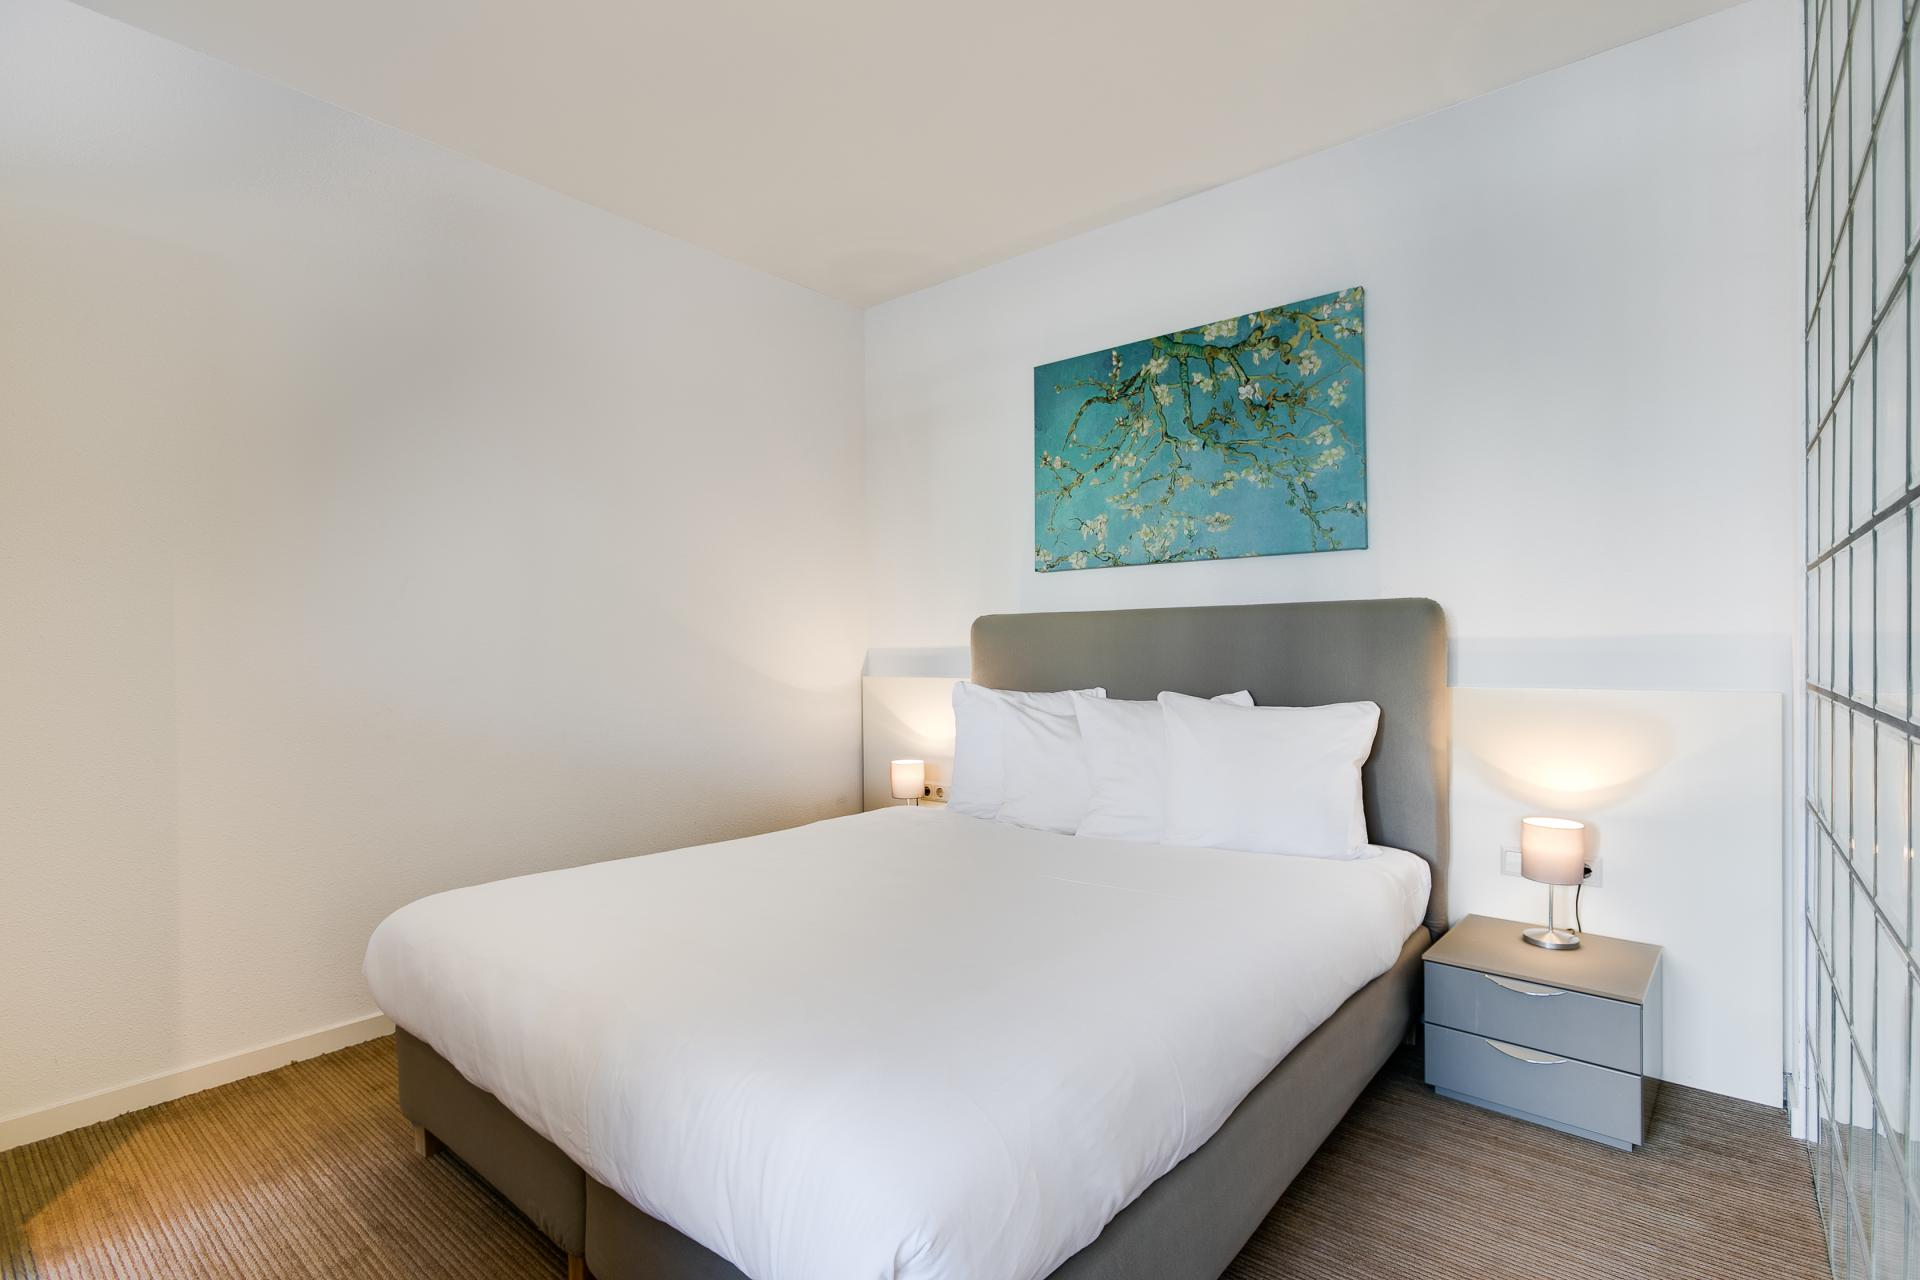 Bedroom at Htel Amstelveen, Amsterdam - Citybase Apartments